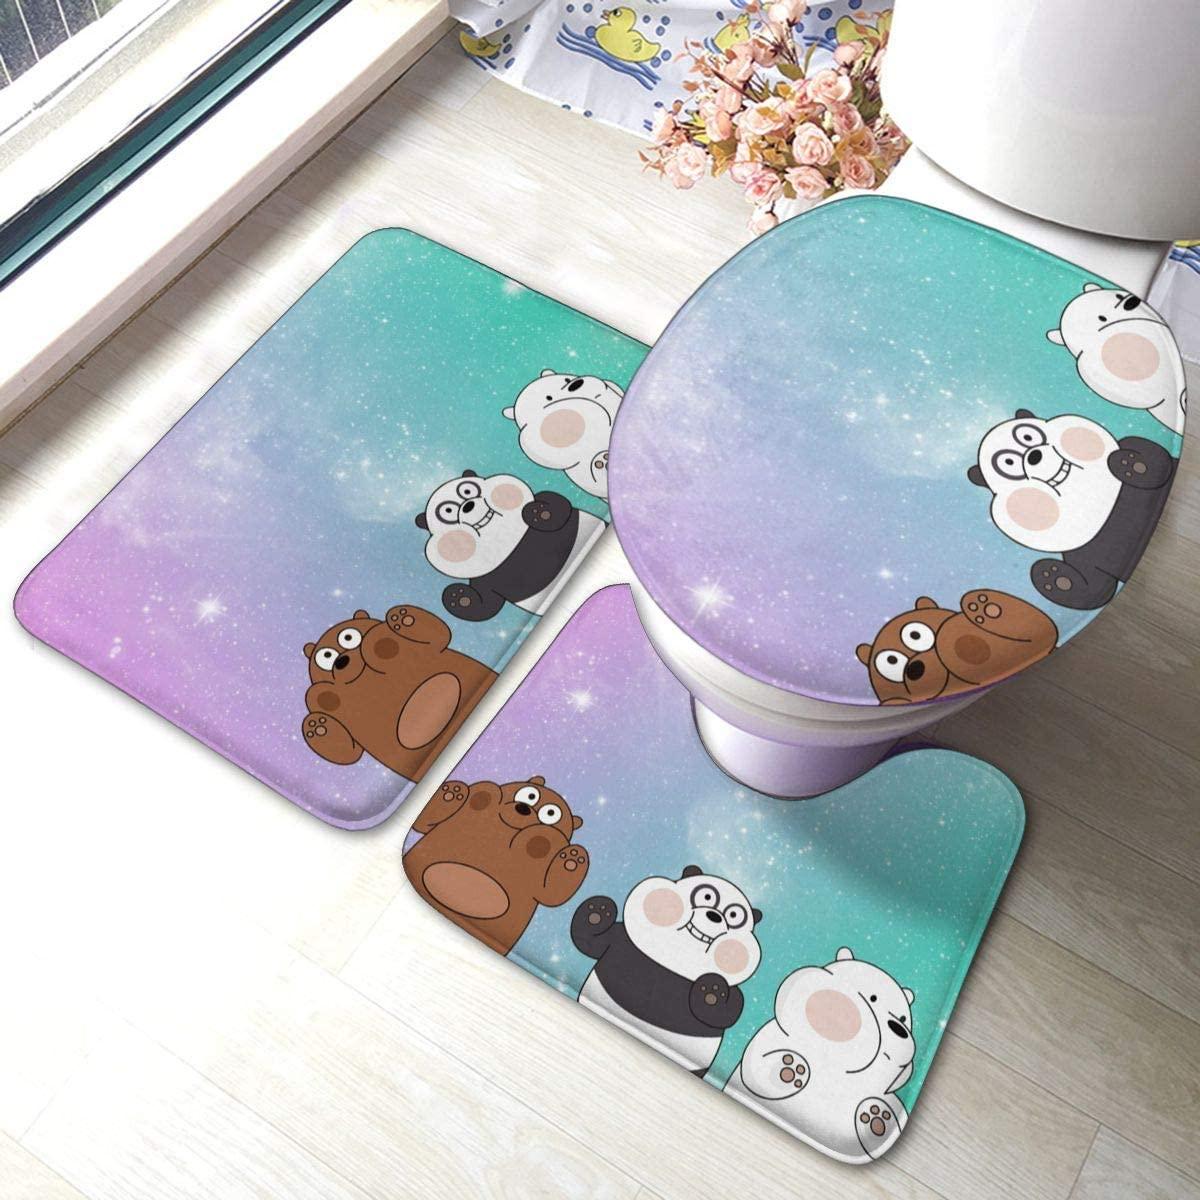 Bathroom Antiskid Pad Polar Bear Brown Bear Panda Cute Cool We Bare Bears Bathroom Rugs Set 3 Piece Carpets Mats For Tub Water Absorption Contour Toilet Lid Cover Doormat Non-Slip Machine Washable